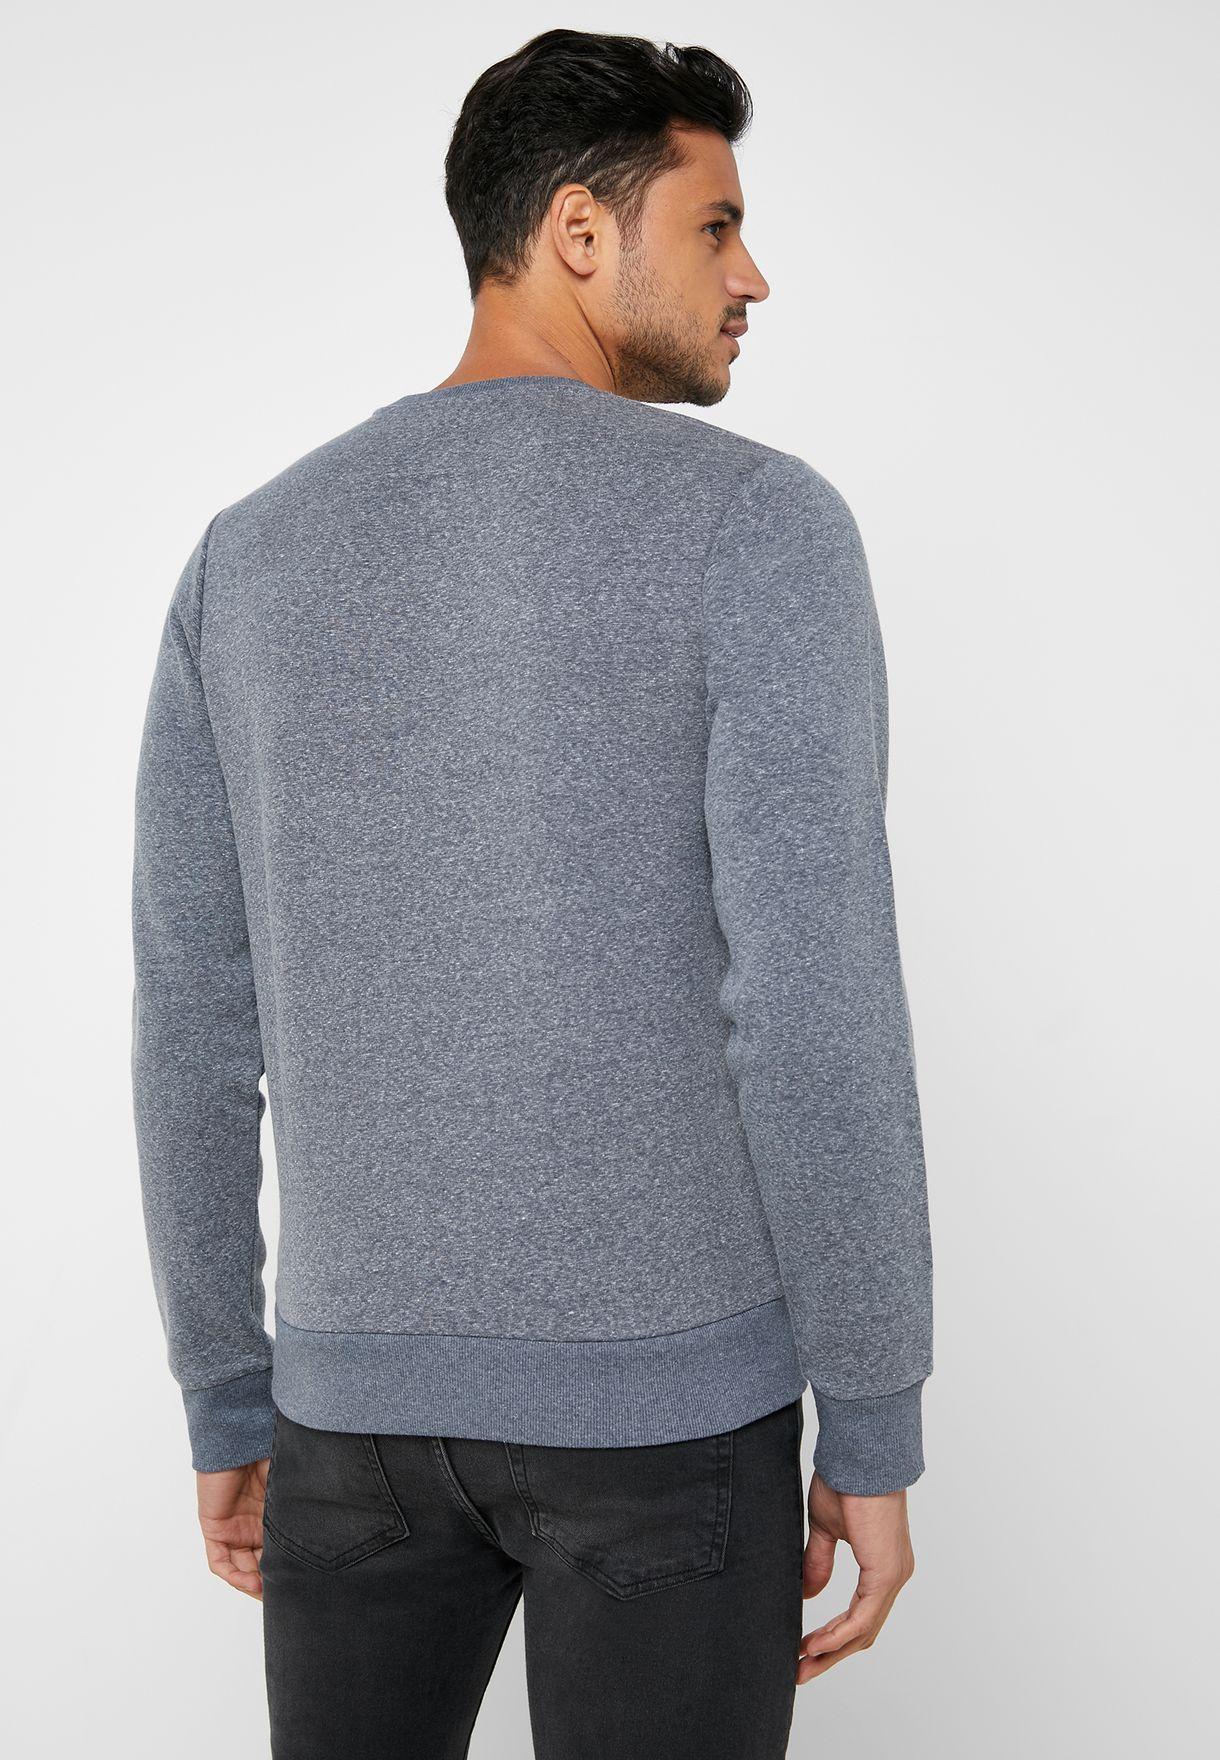 Kemble Regular Fit Sweatshirt